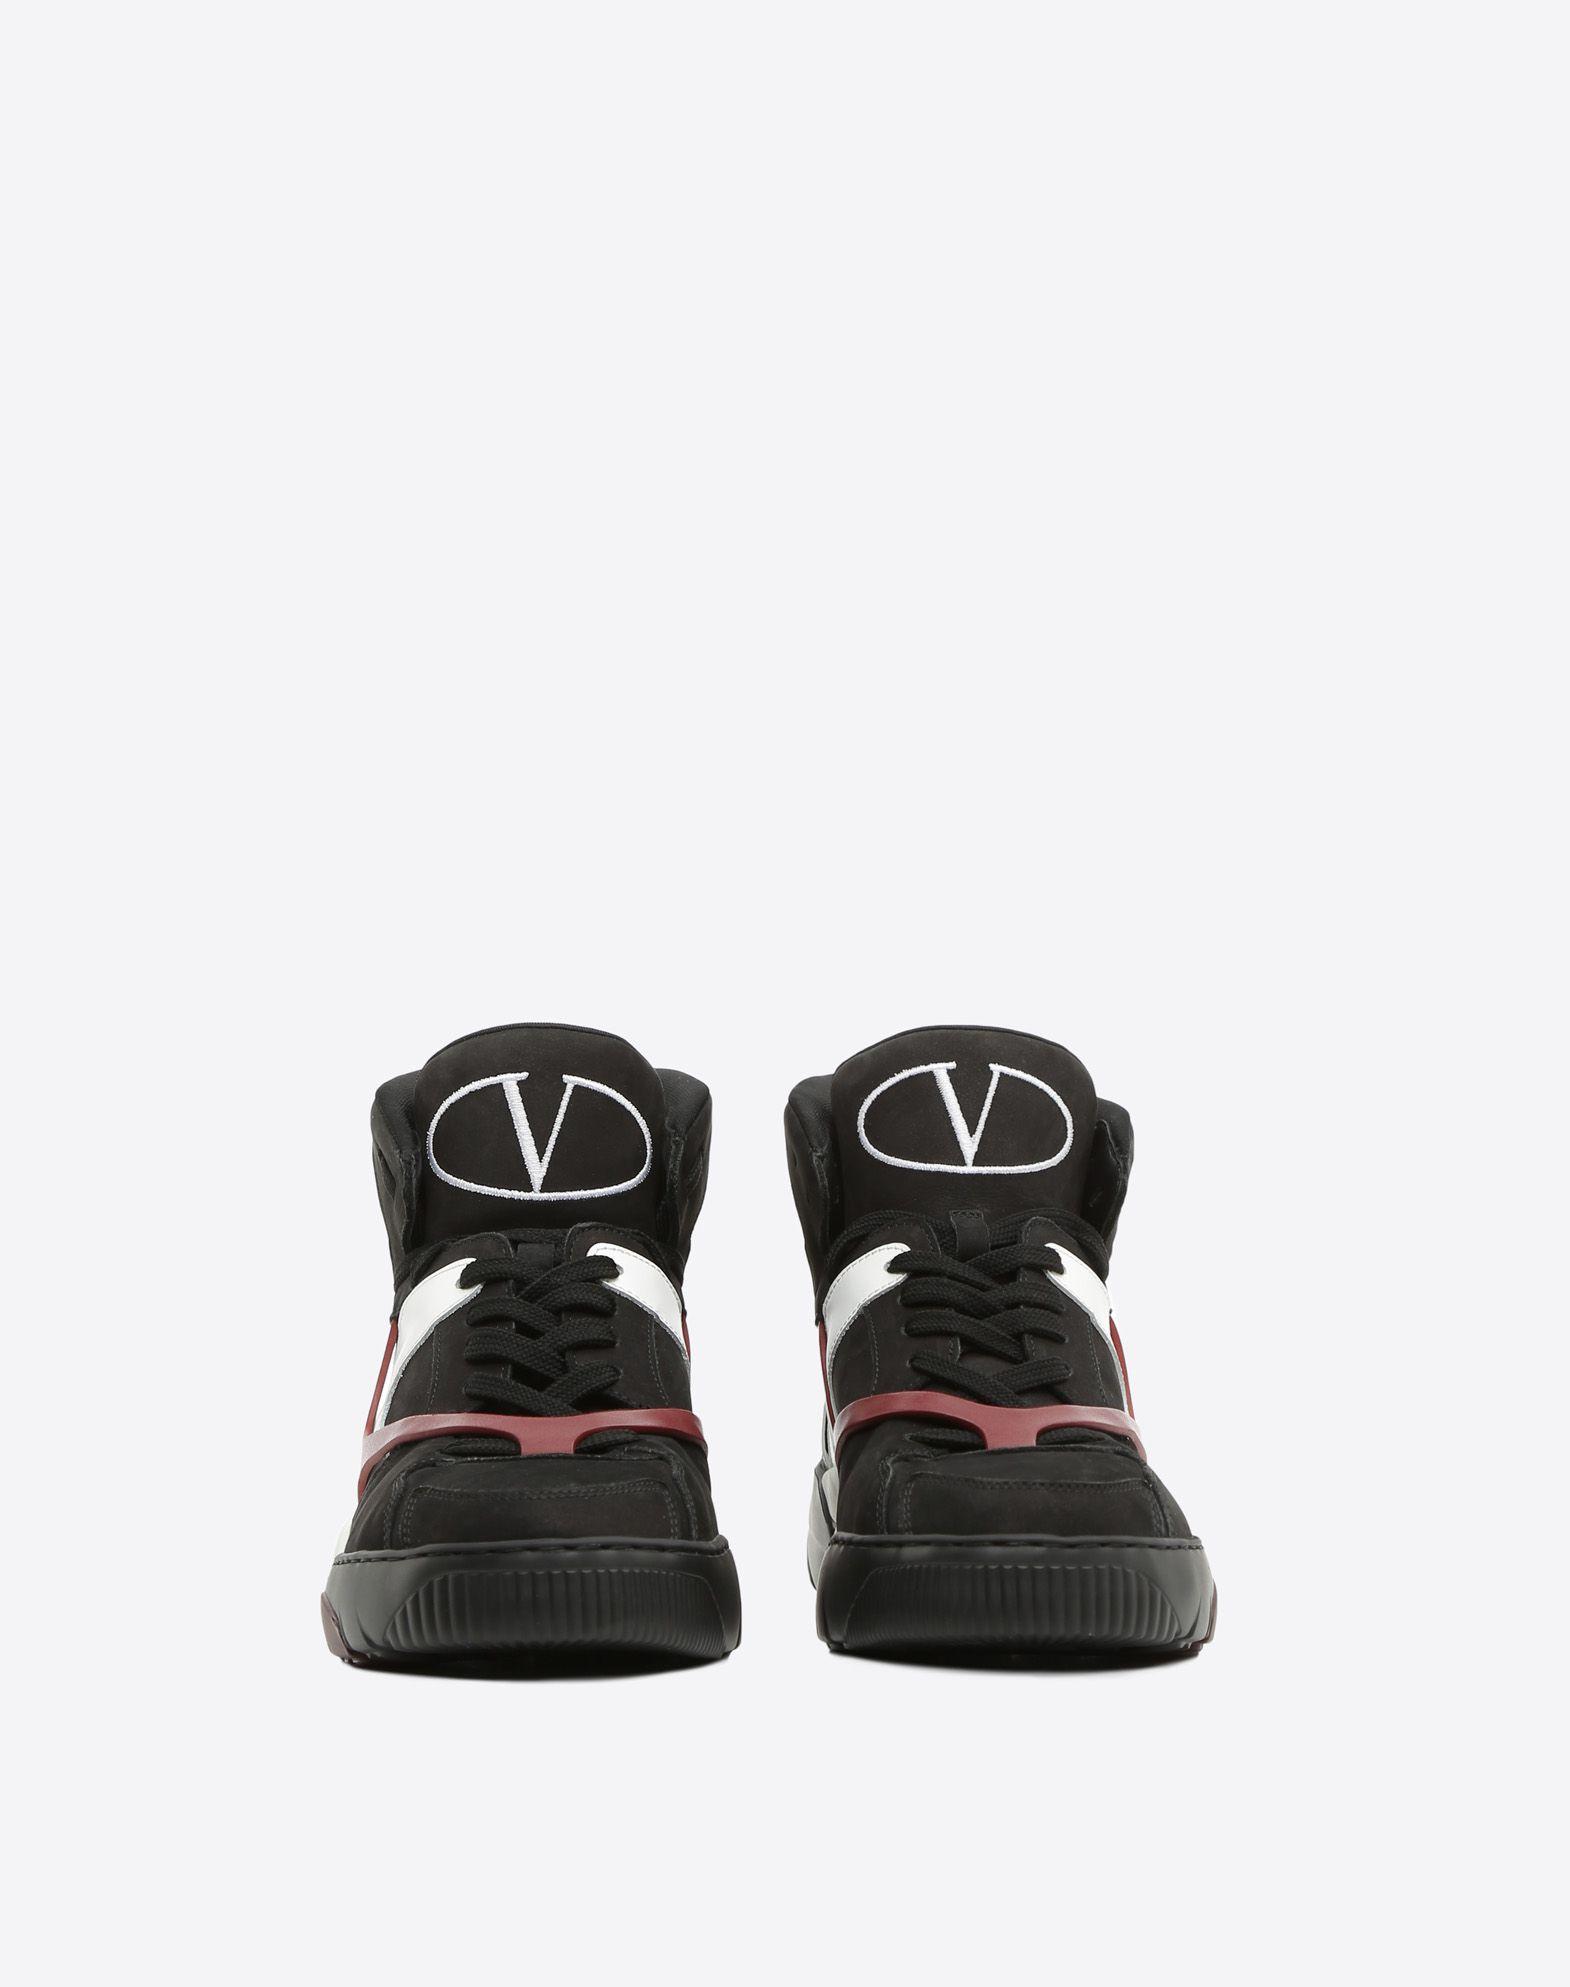 VALENTINO GARAVANI UOMO Made One 运动鞋 高帮运动鞋 U e